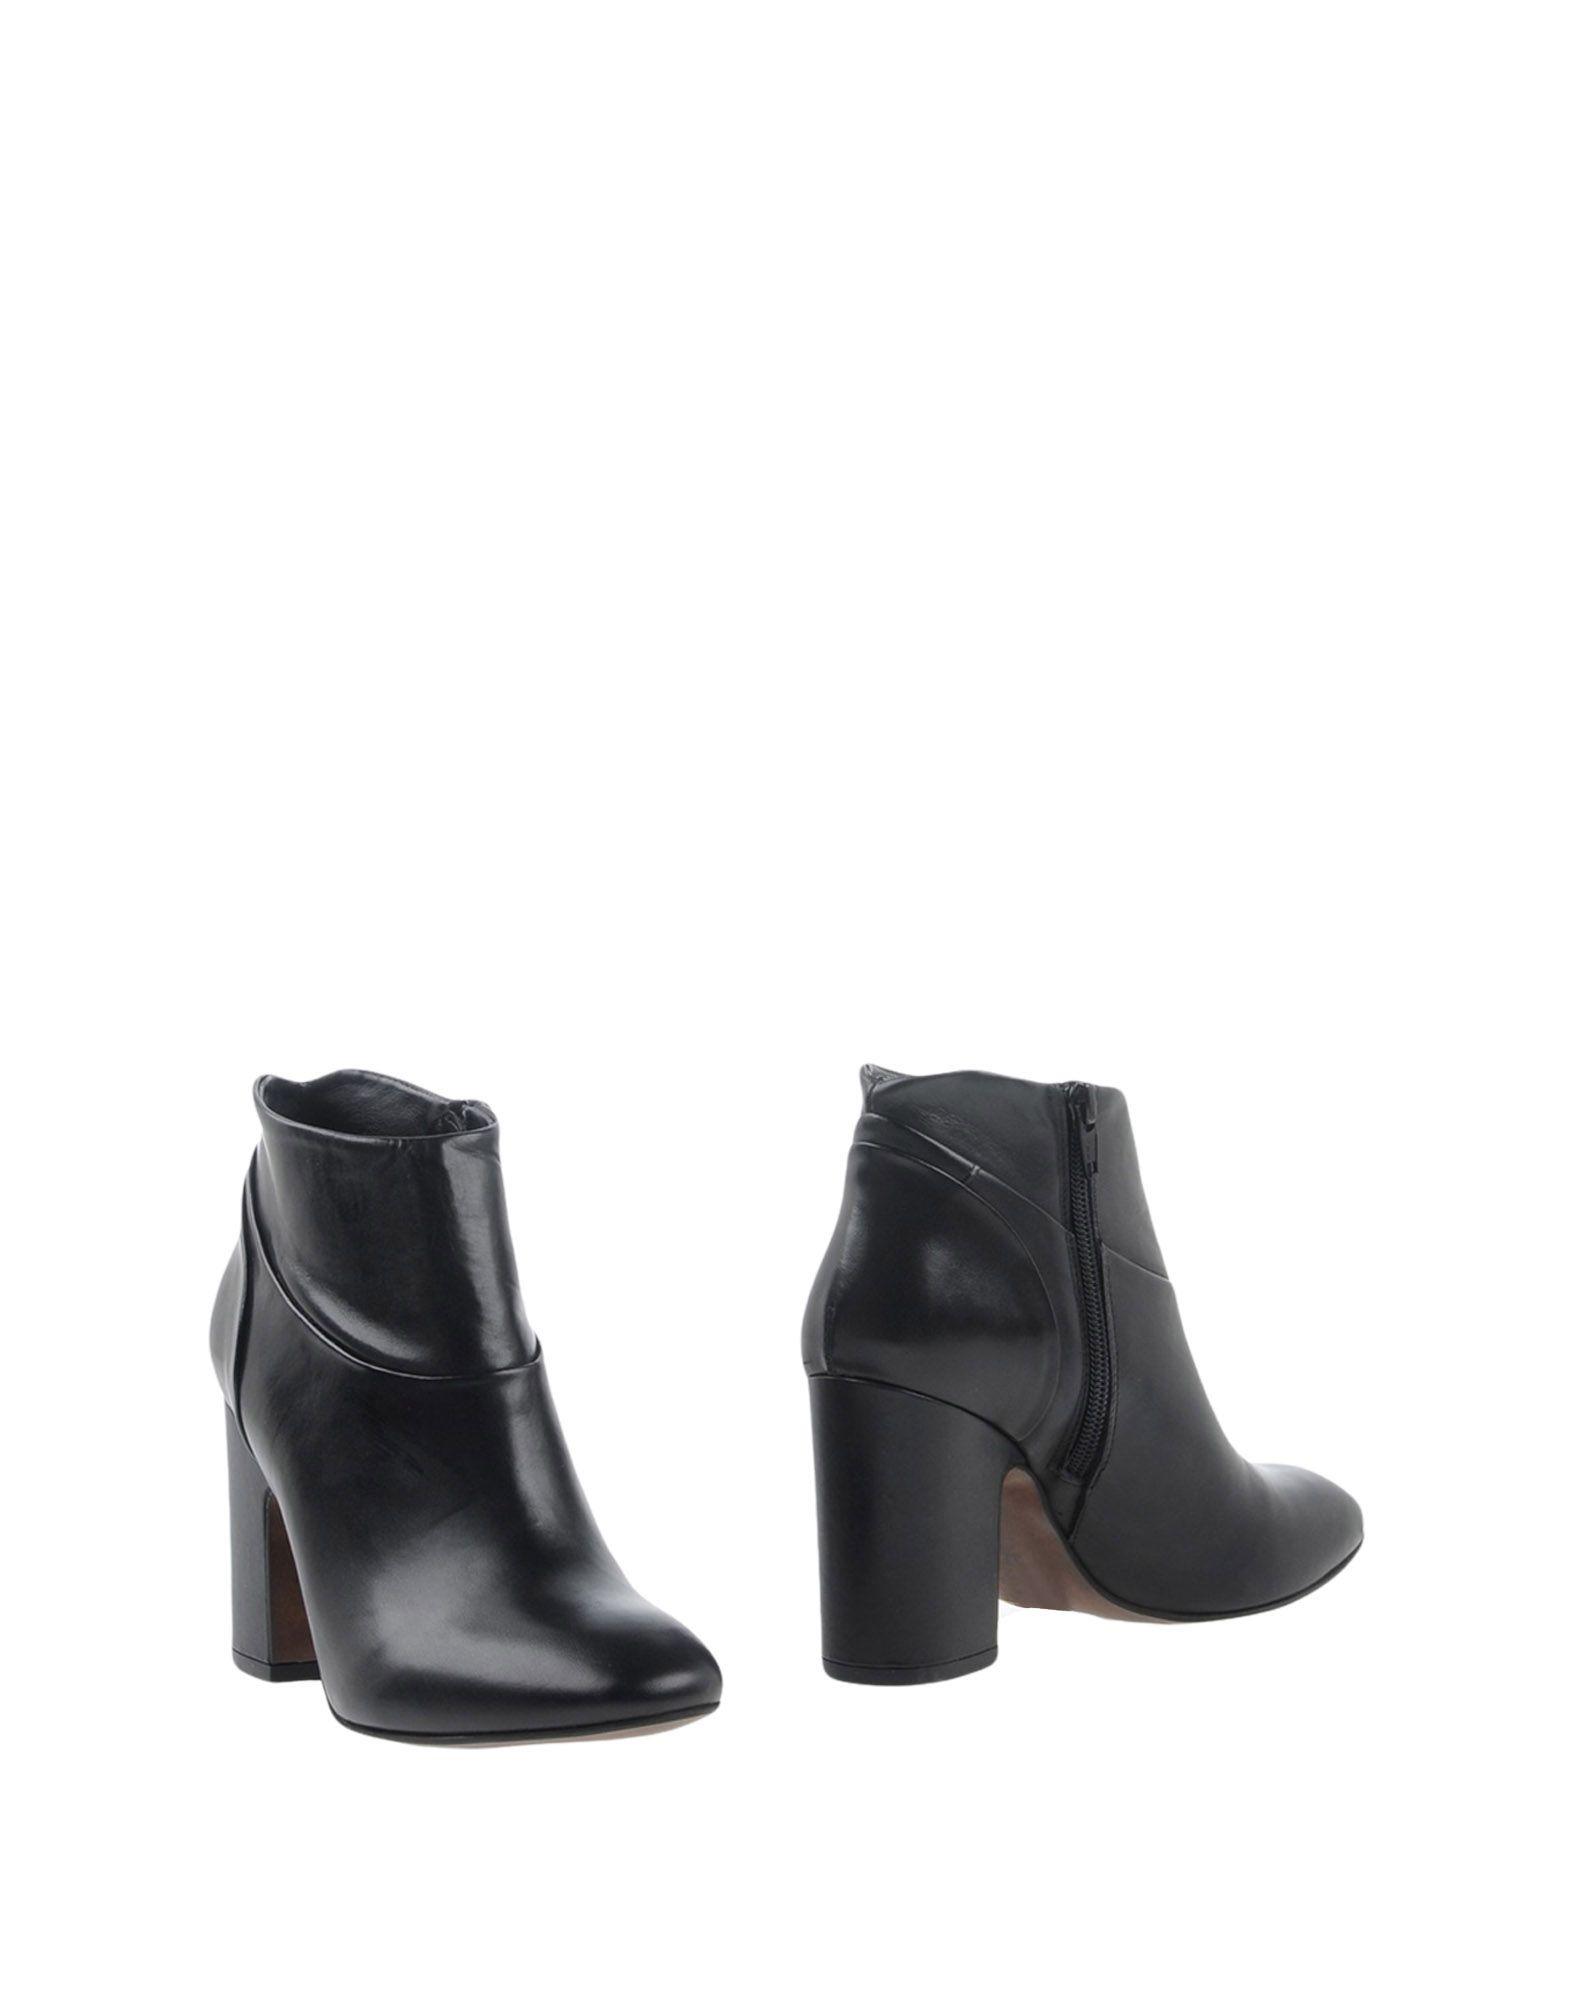 Nila & Nila Stiefelette Damen  11266247NE Gute Qualität beliebte Schuhe